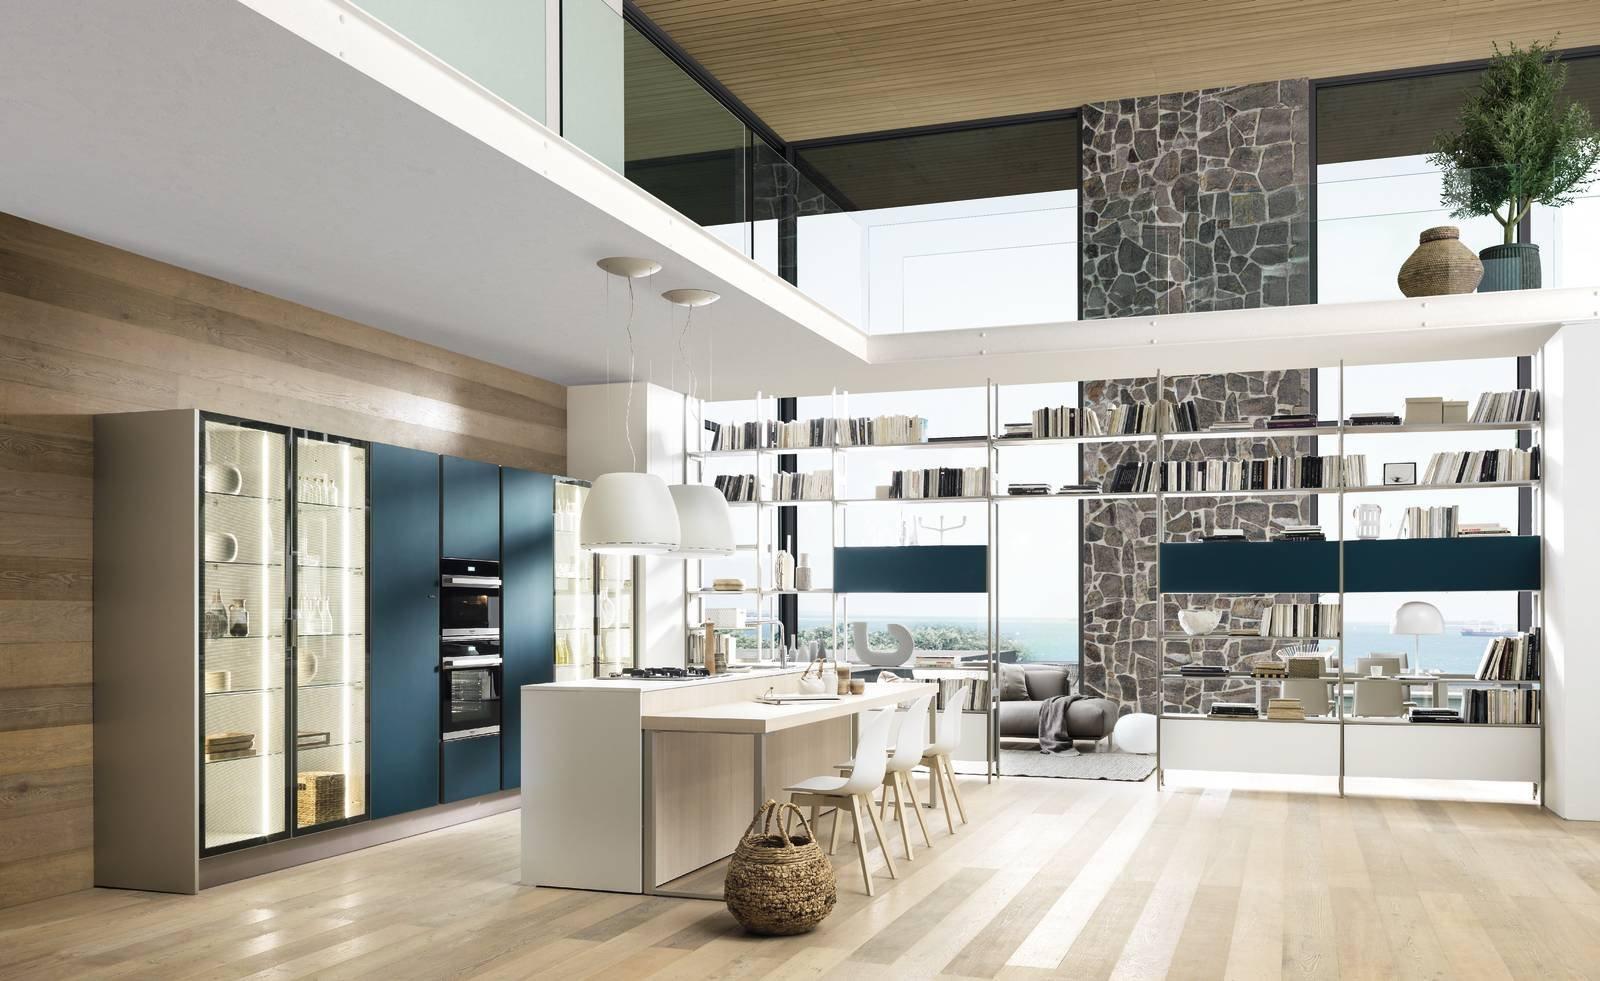 14 soluzioni coordinate di cucina soggiorno cose di casa - Cucina in casa ...